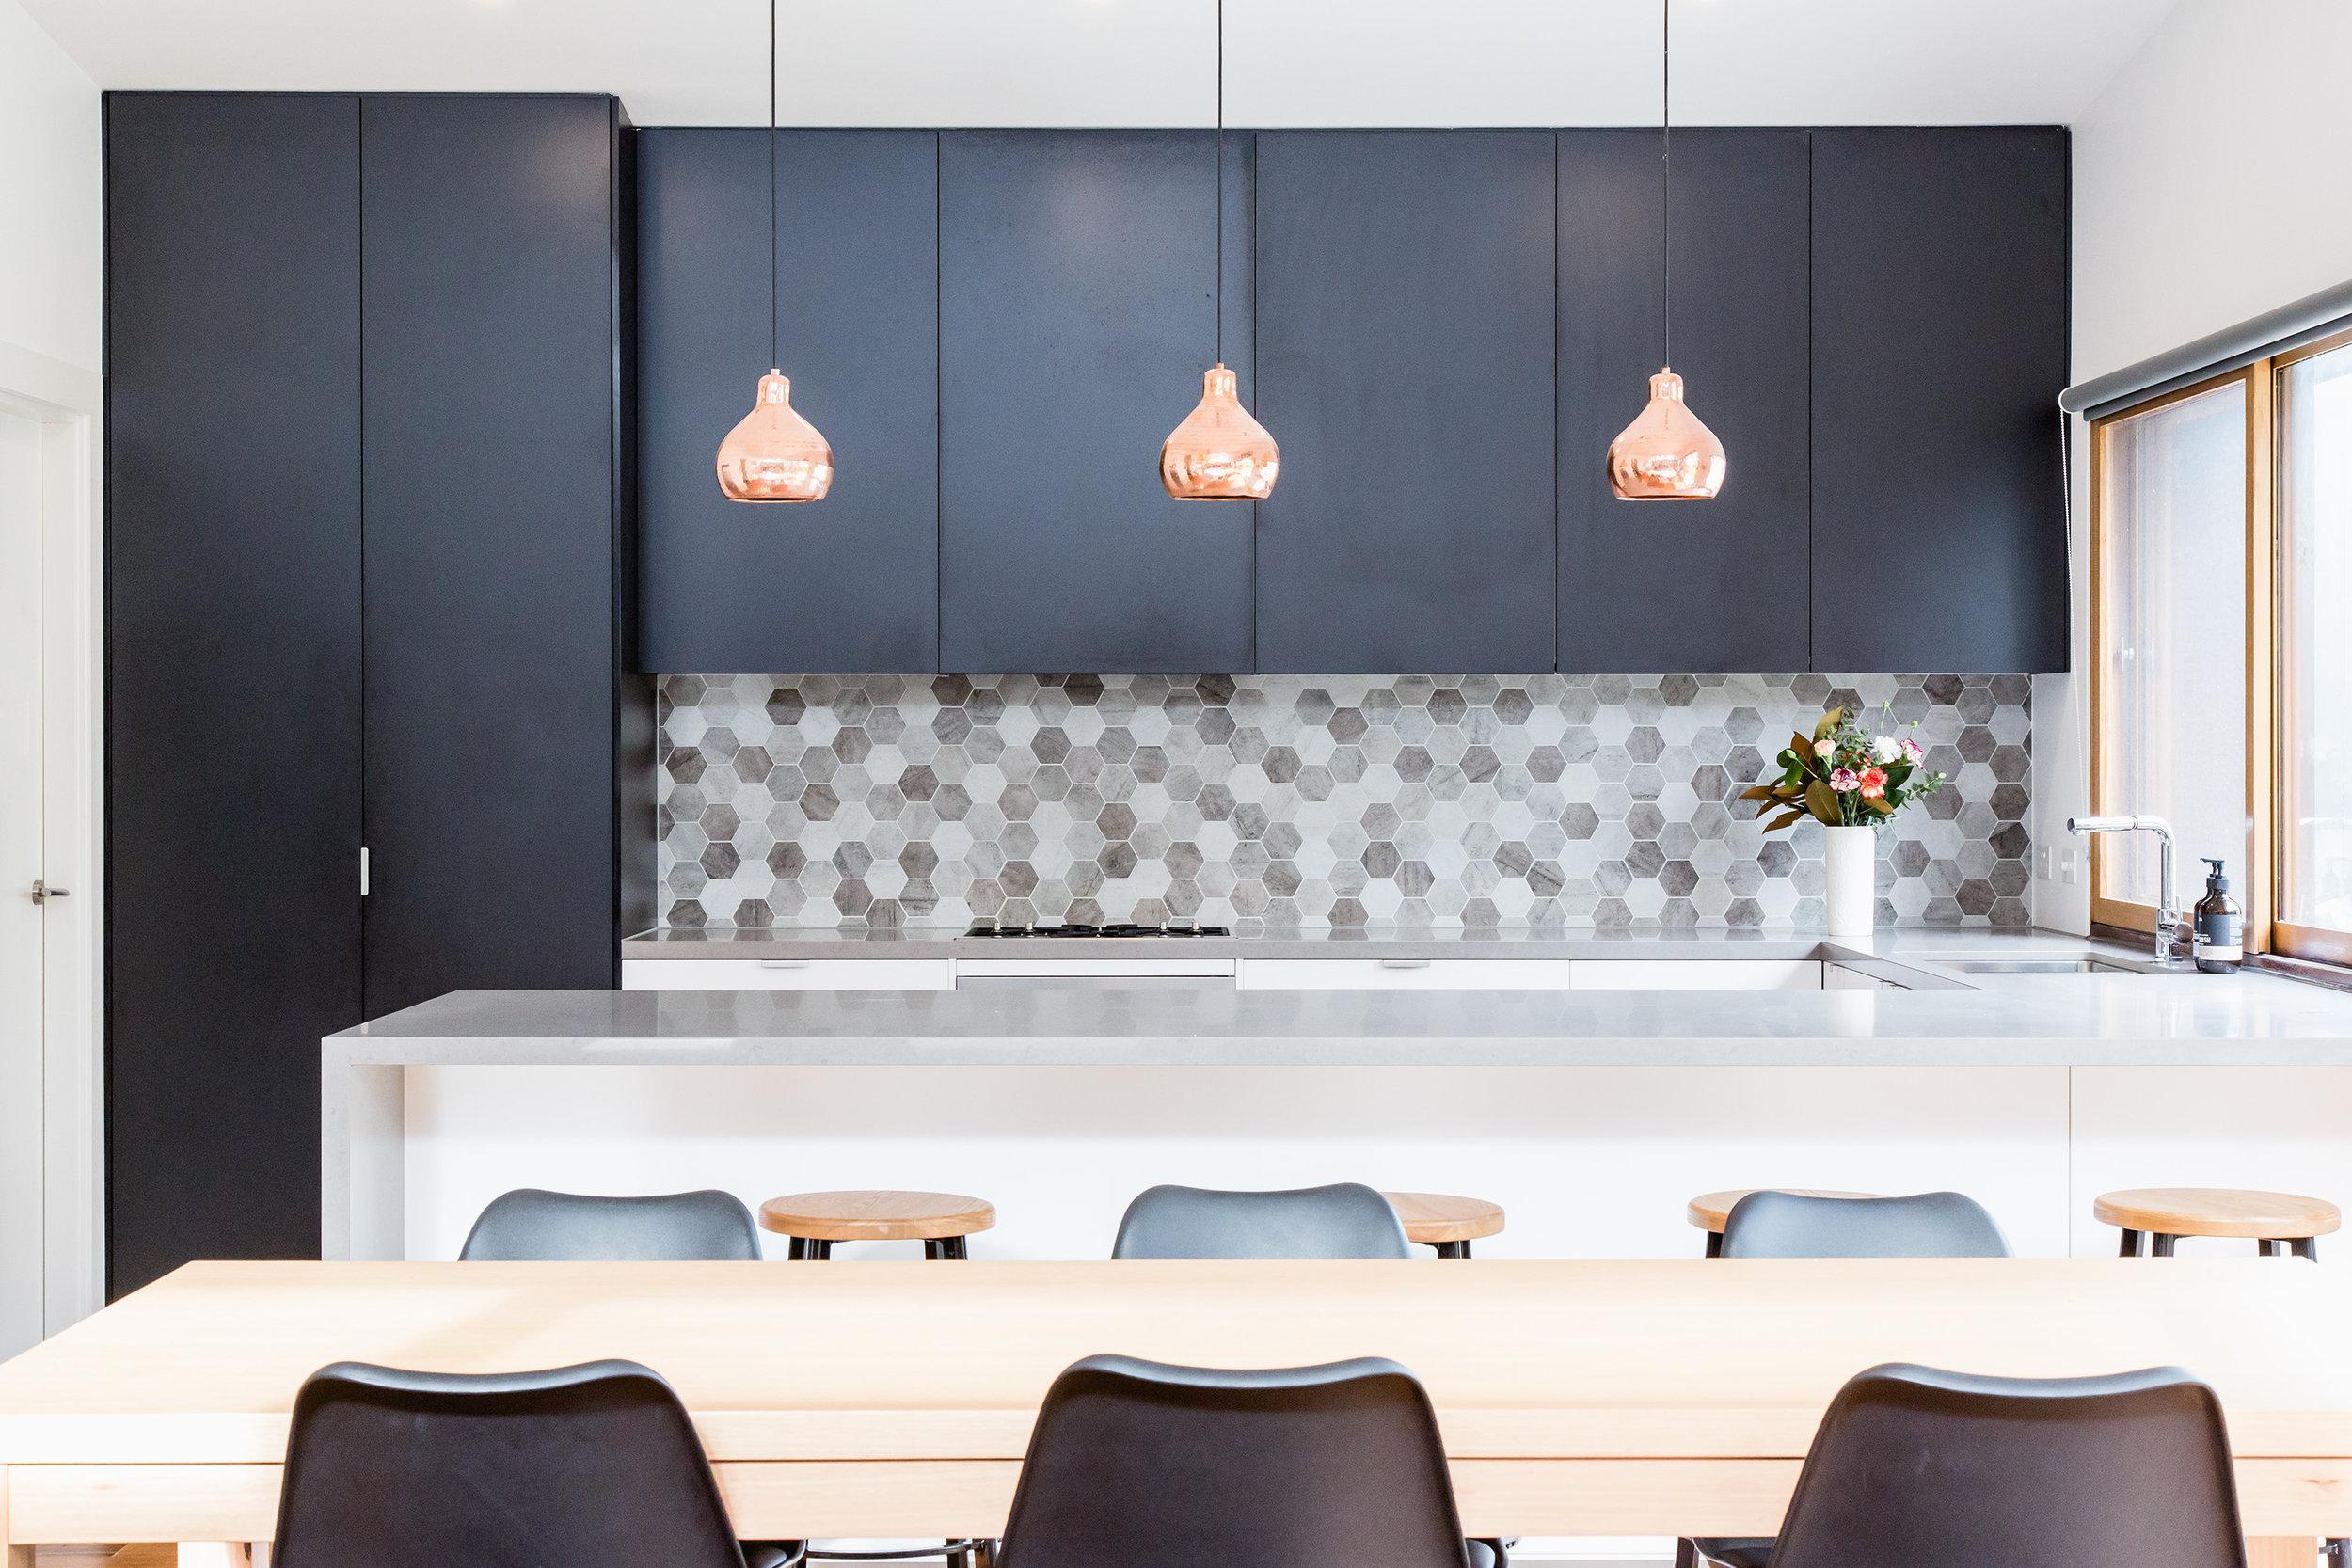 Styling by Fiona Parry-Jones / Von Haus Design Studio